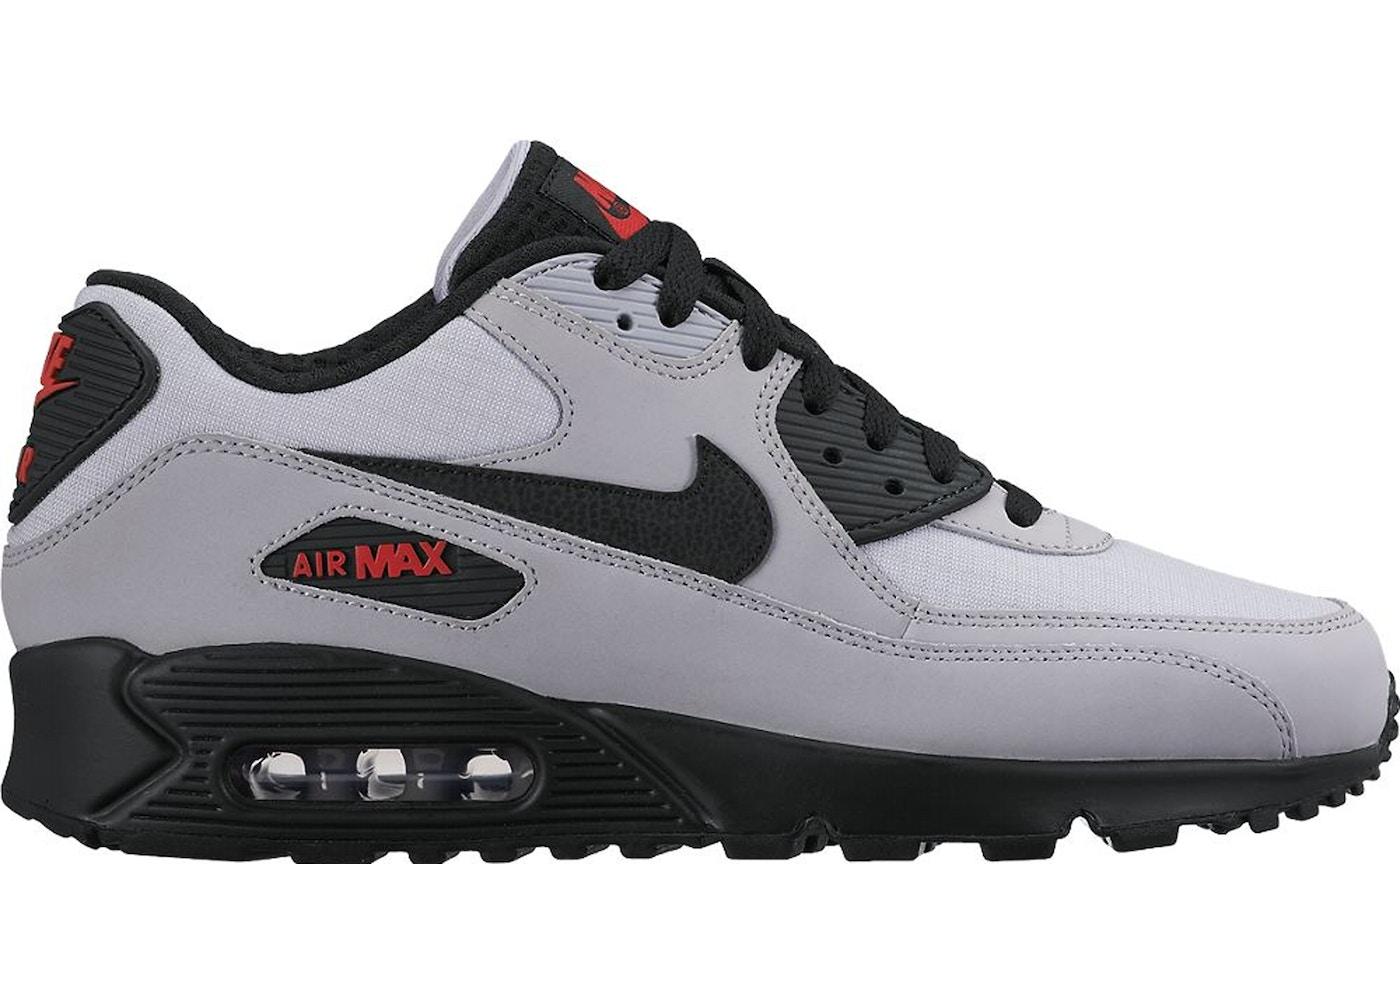 Nike Air Max 90 Wolf Grey Black Red - 537384-049